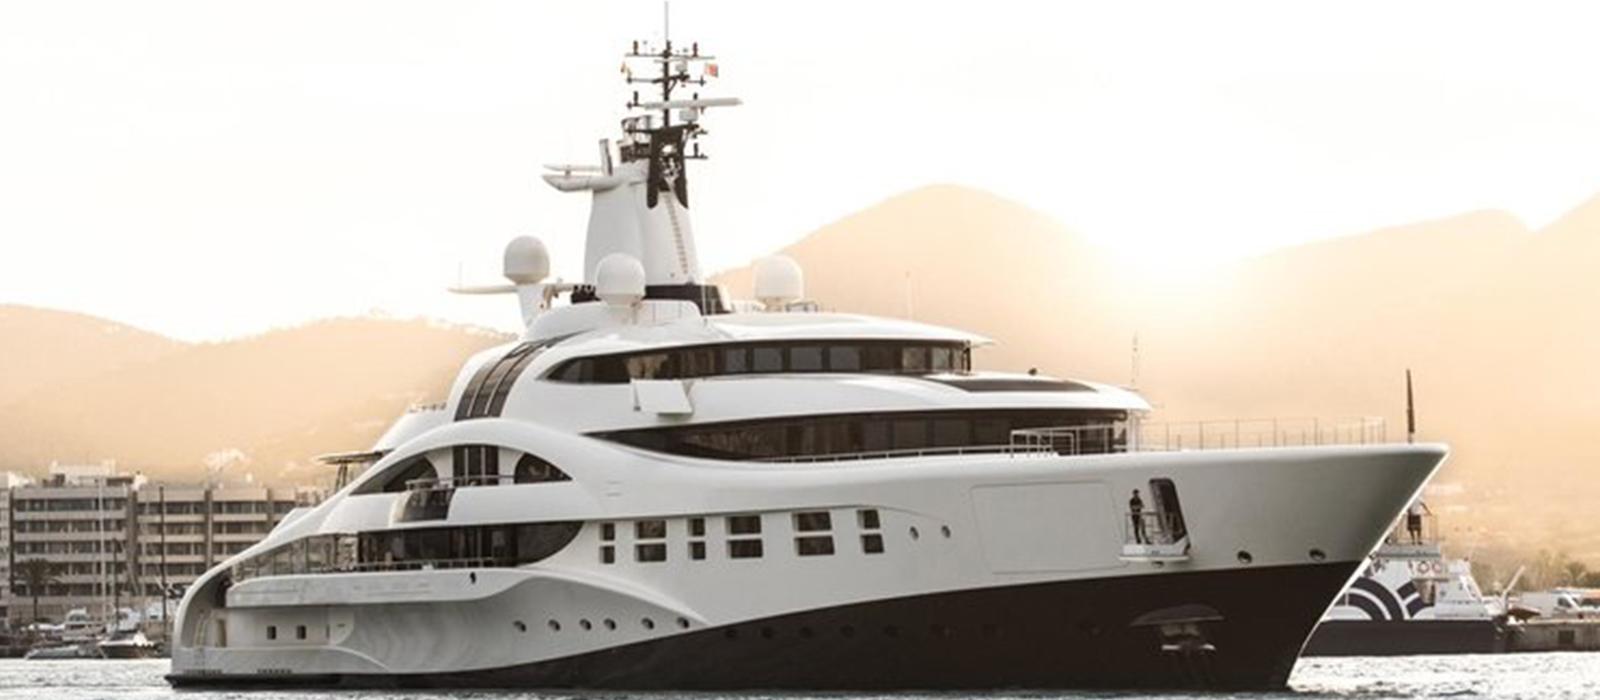 Saxon-Private-Clients-Insurance-Brokers-Superyacht-Palladium-Blohm-Voss-Marina-Ibiza.jpg